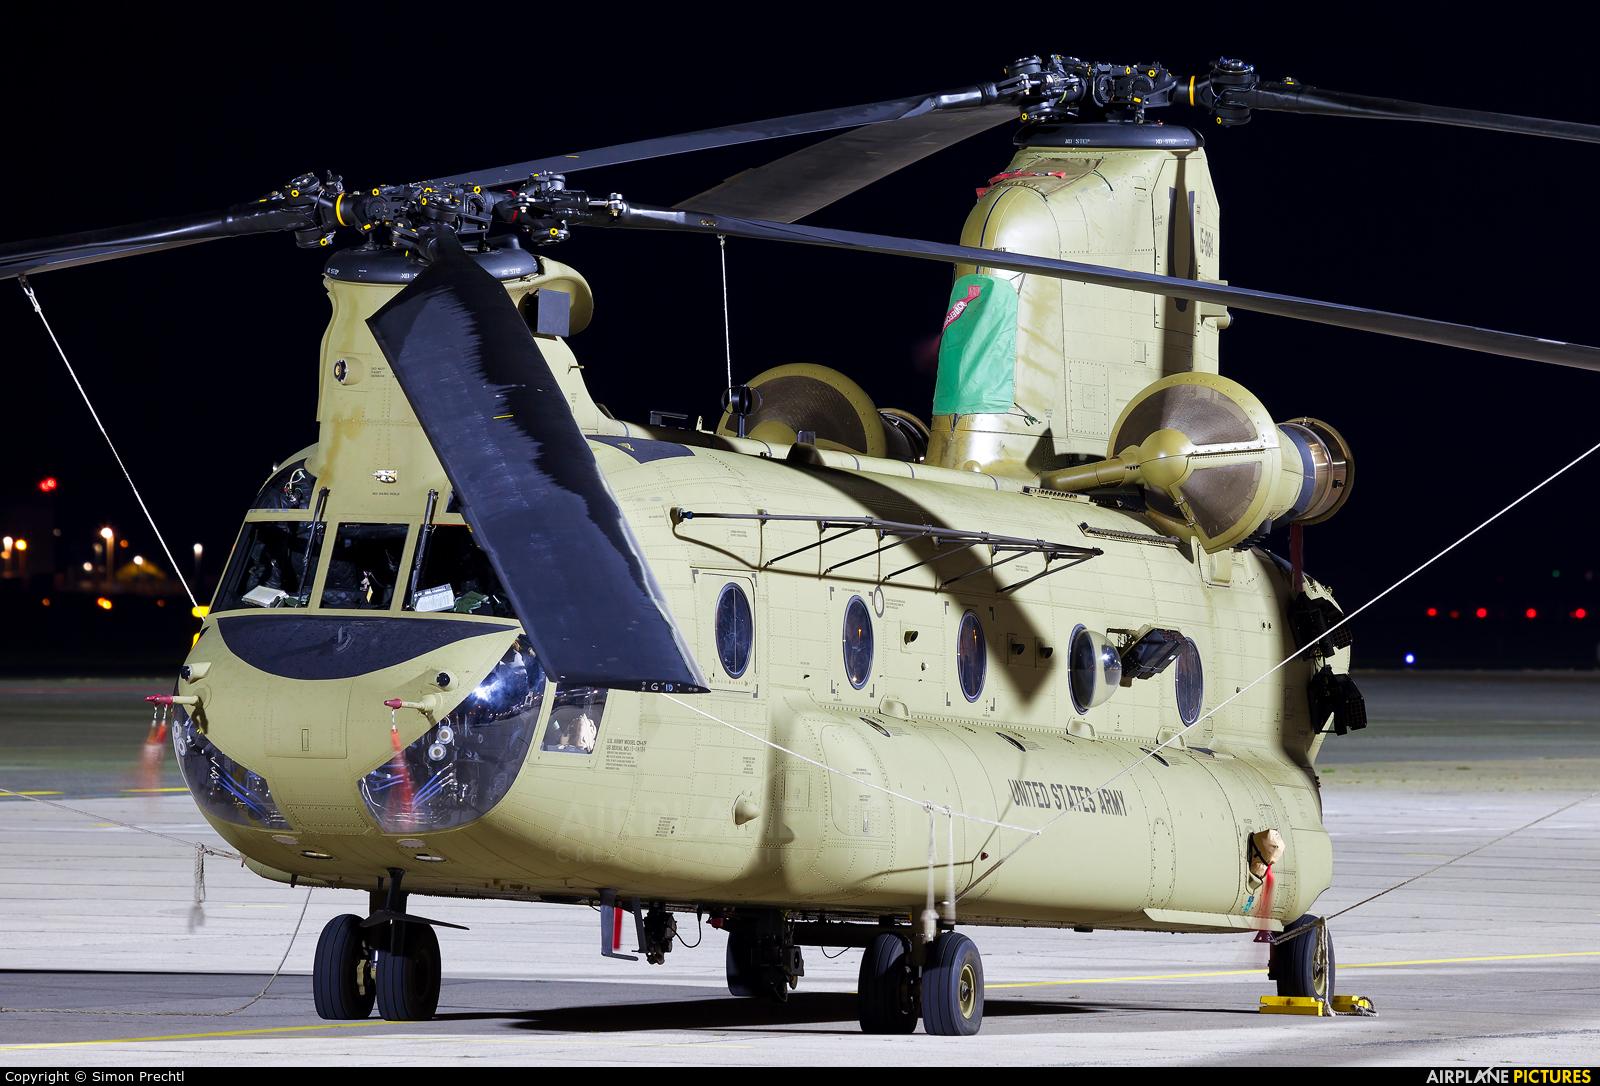 USA - Army 15-08184 aircraft at Linz